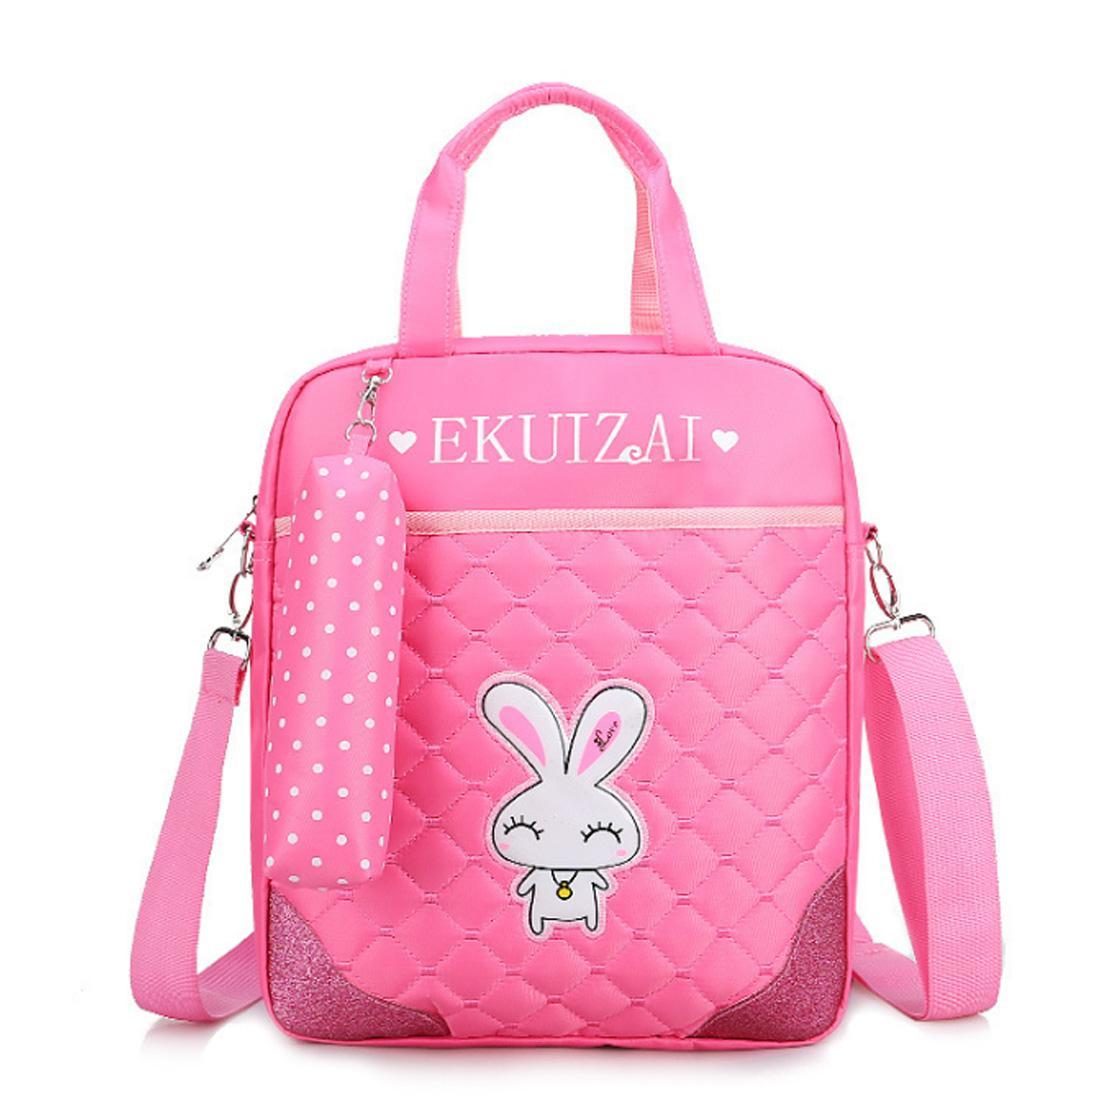 Giá bán 360WISH Cross-body Schoolbag Children Tutorial Bag Lightweight Backpack for Kids - Pink